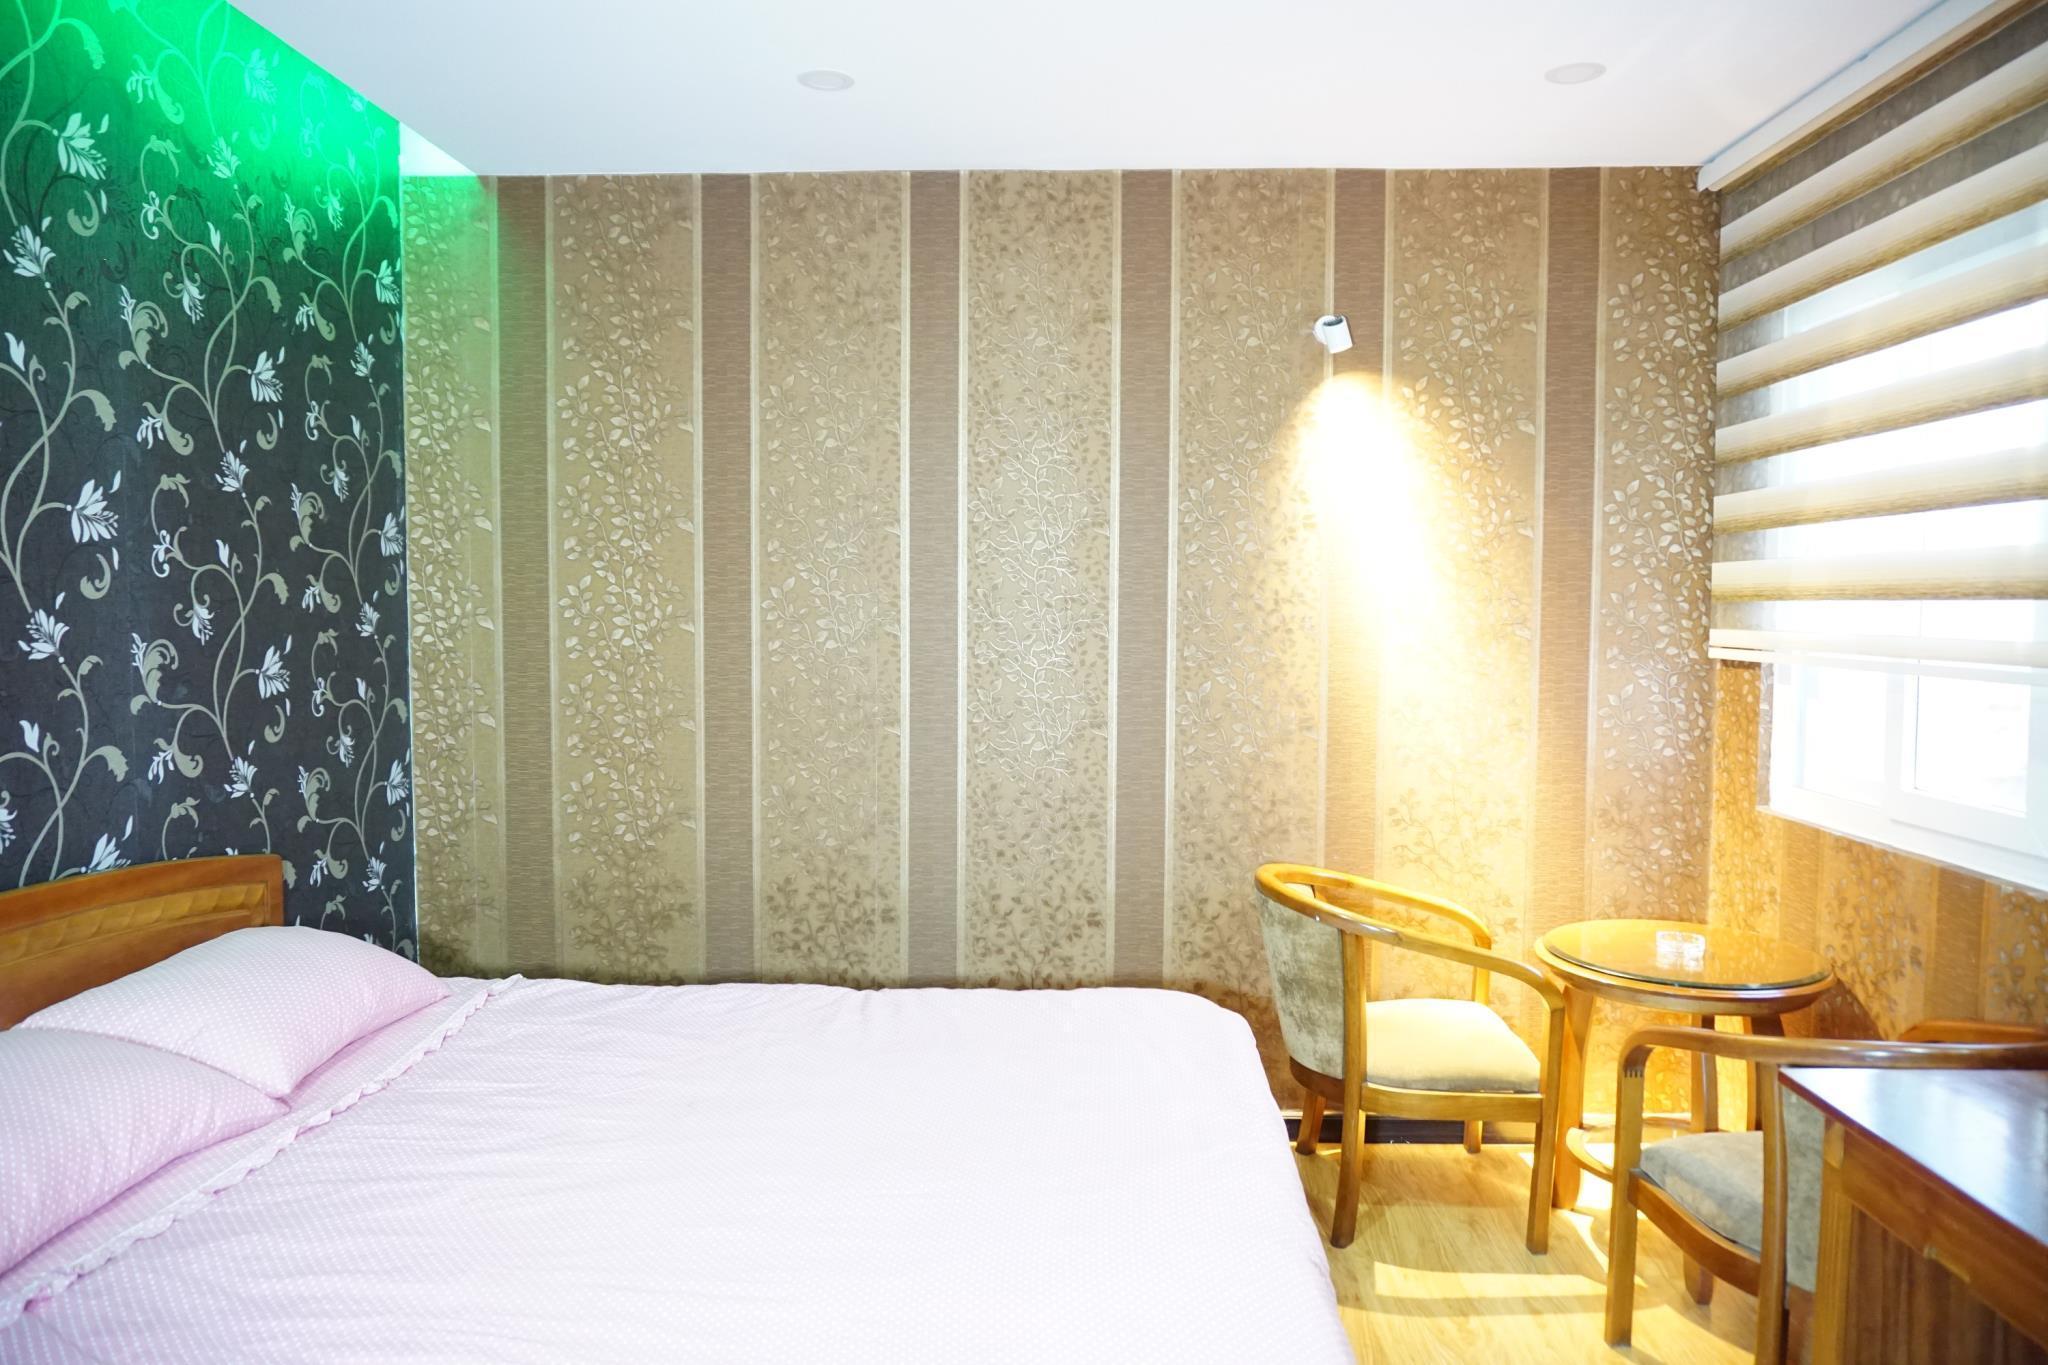 Adamas Hanoi Hotel Best Price On Joriwon Hotel In Ho Chi Minh City Reviews